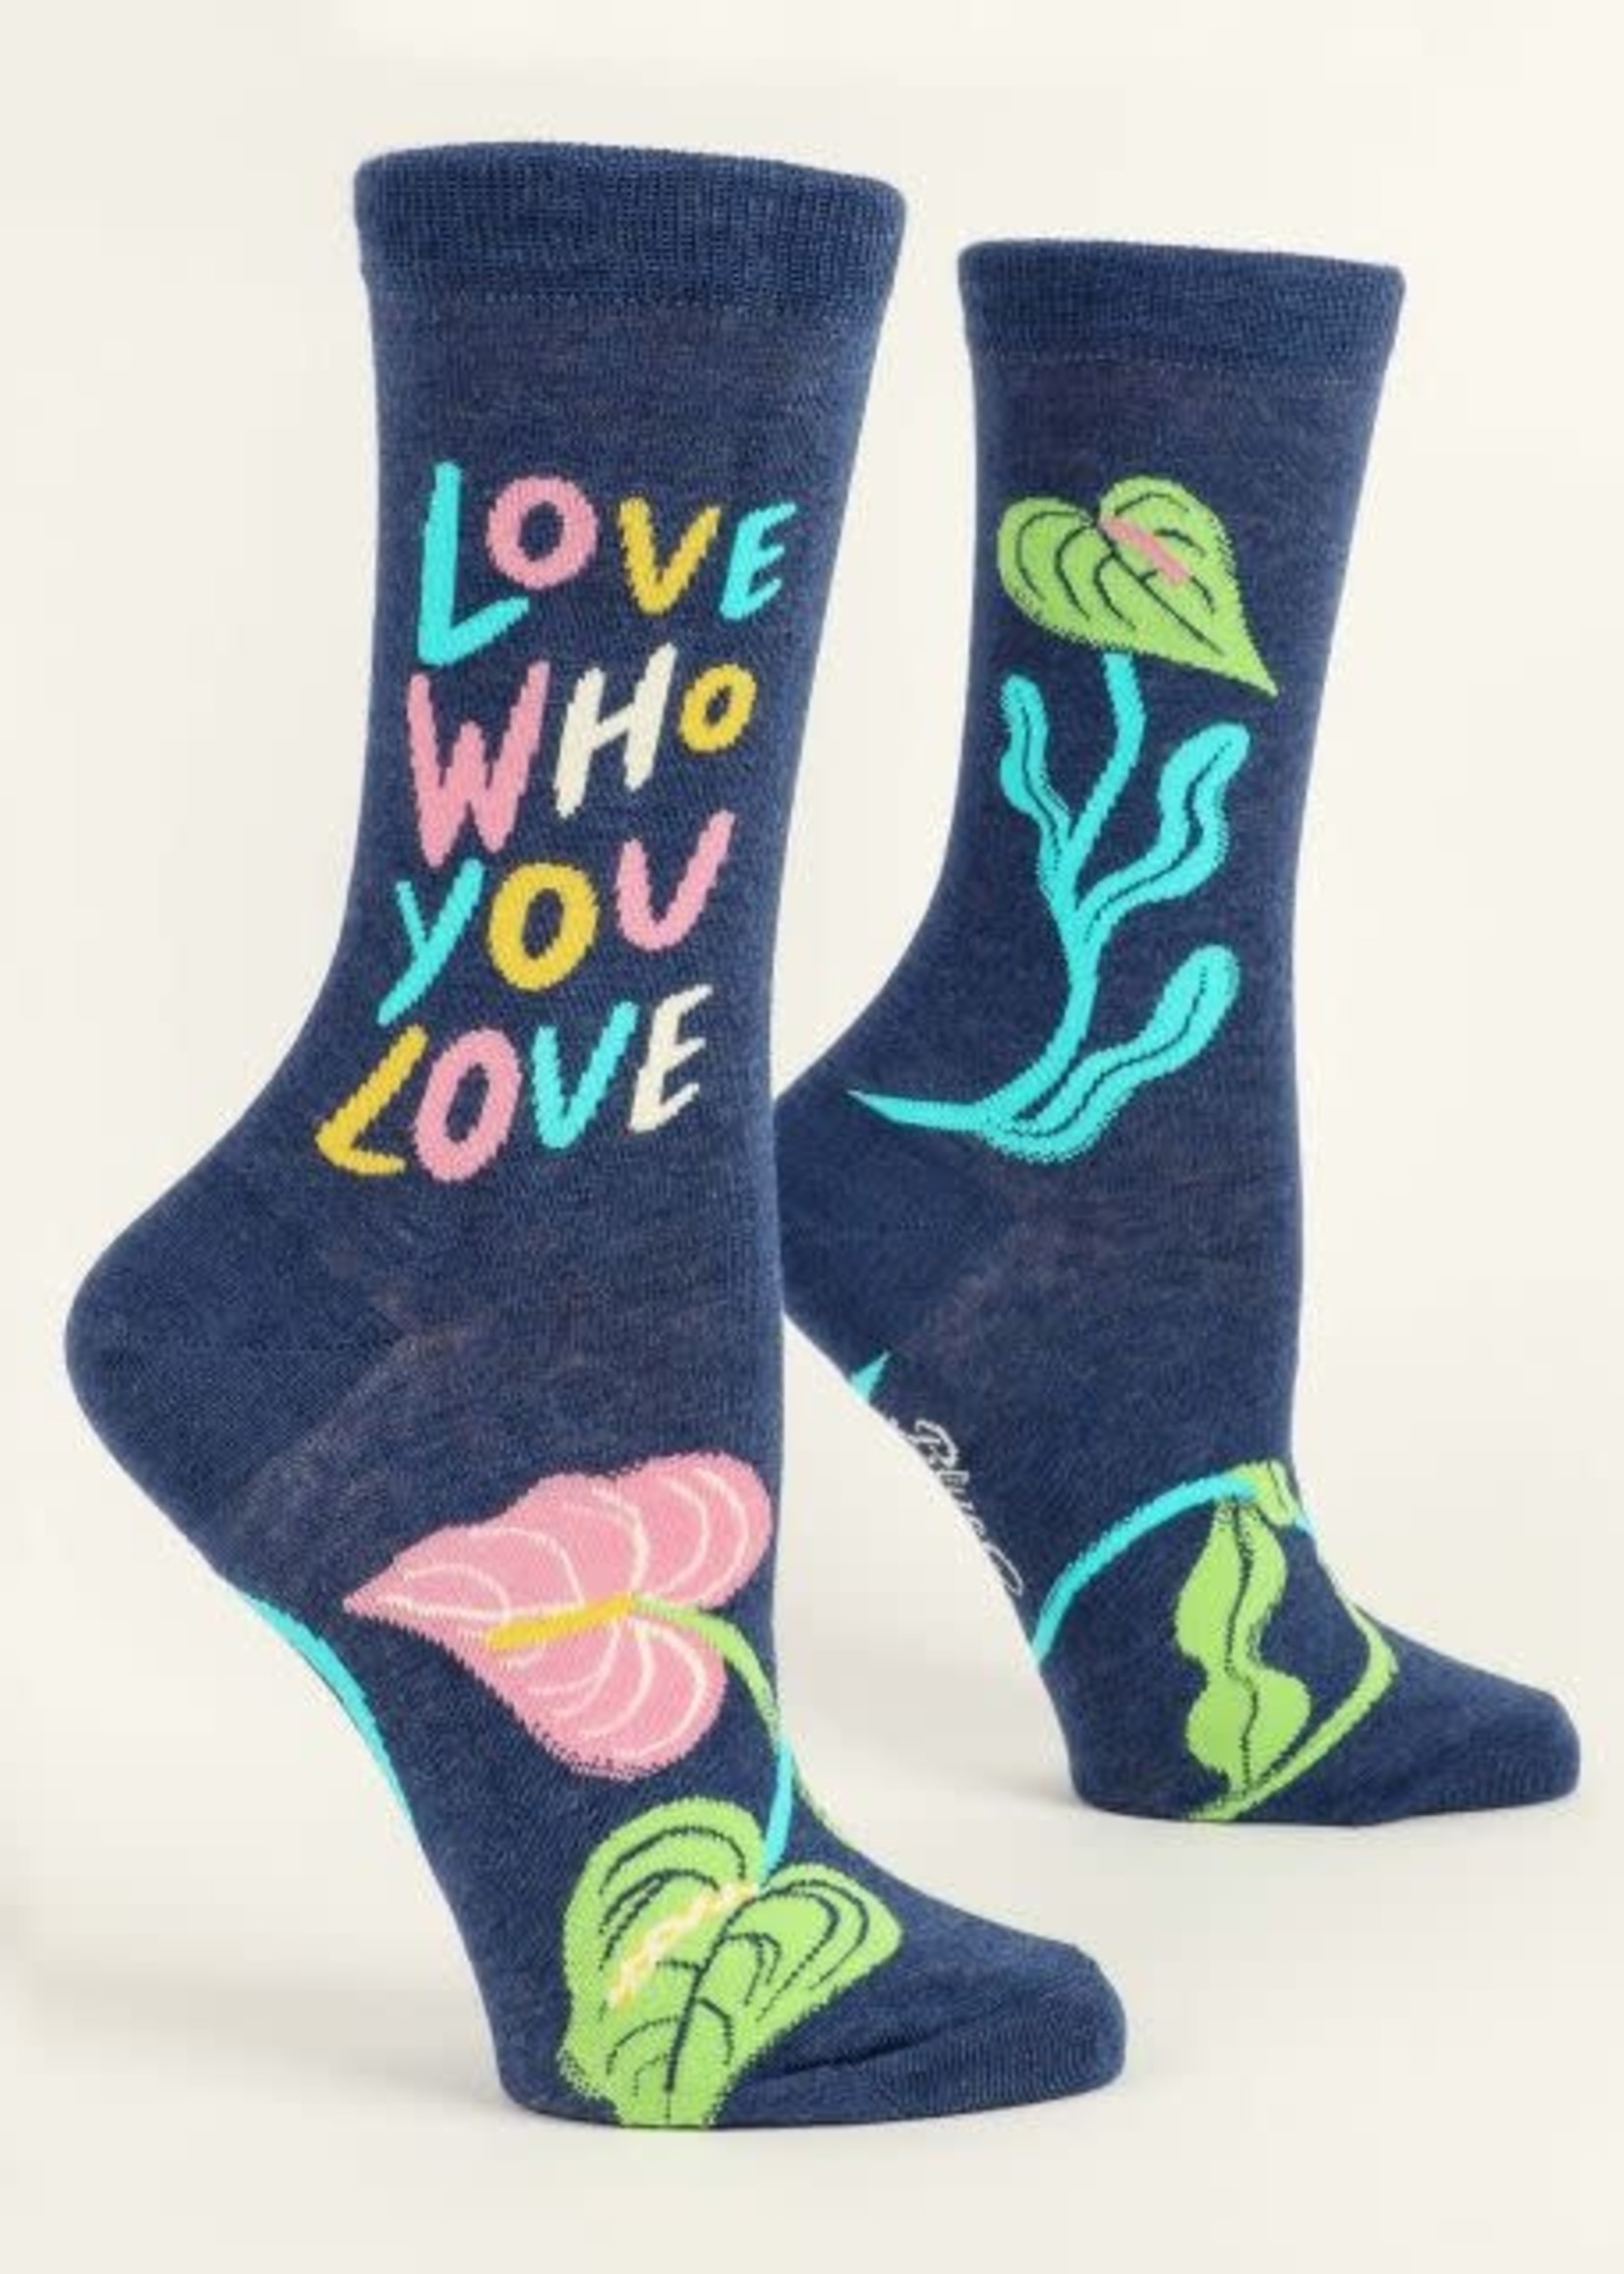 BLUE Q BLUE Q LOVE WHO YOU LOVE WOMEN'S SOCKS